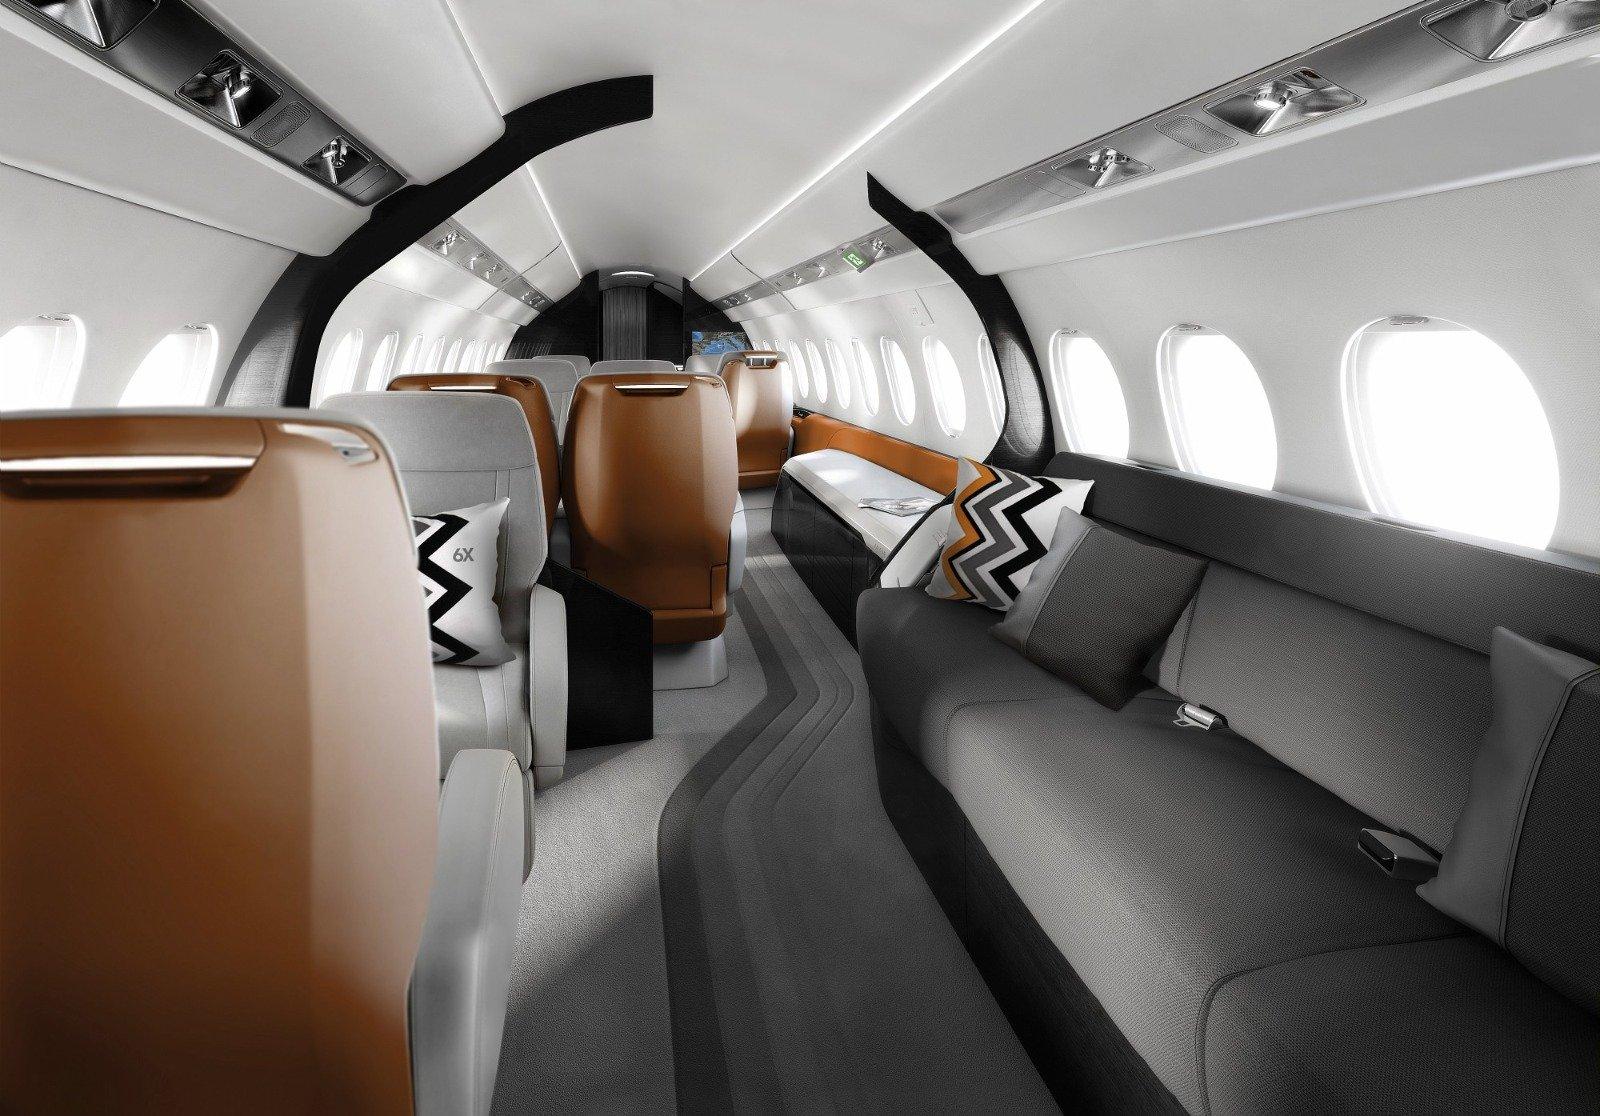 Dassault Aviation Launches Falcon 6X - Press kits